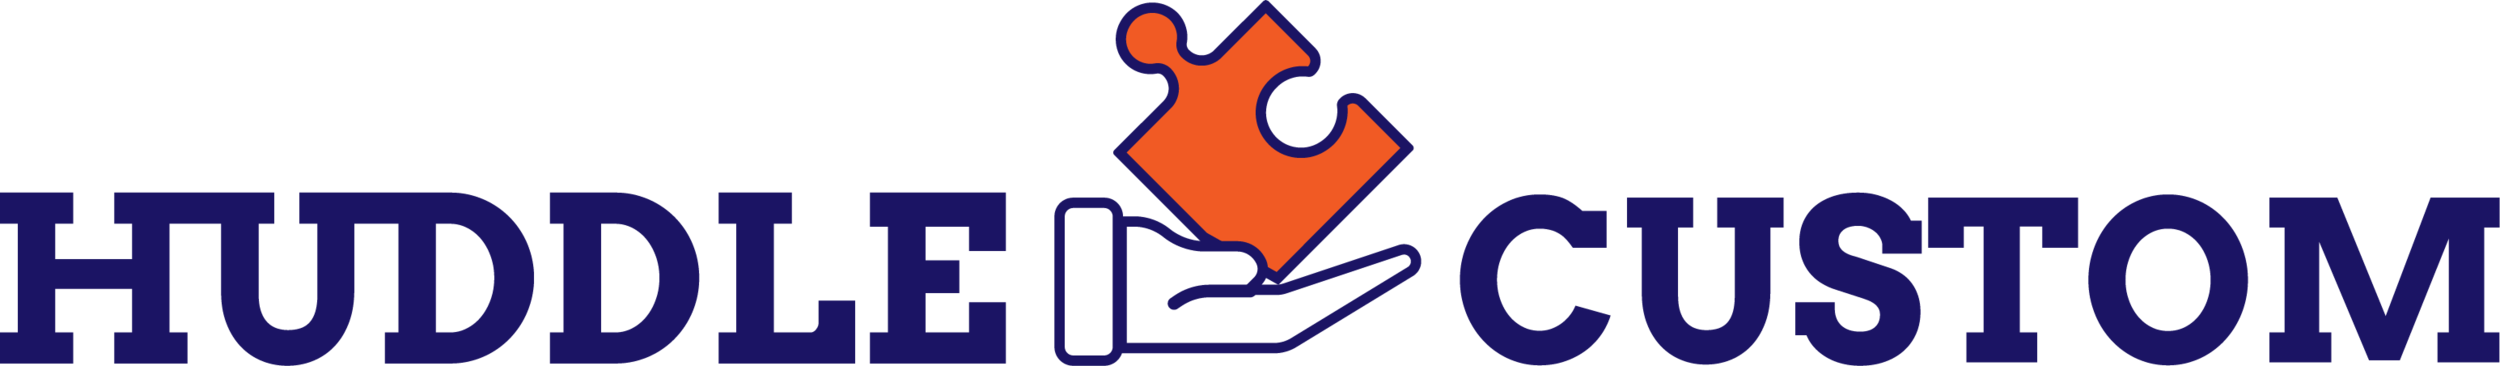 Logos _Huddle Custom - Color.png